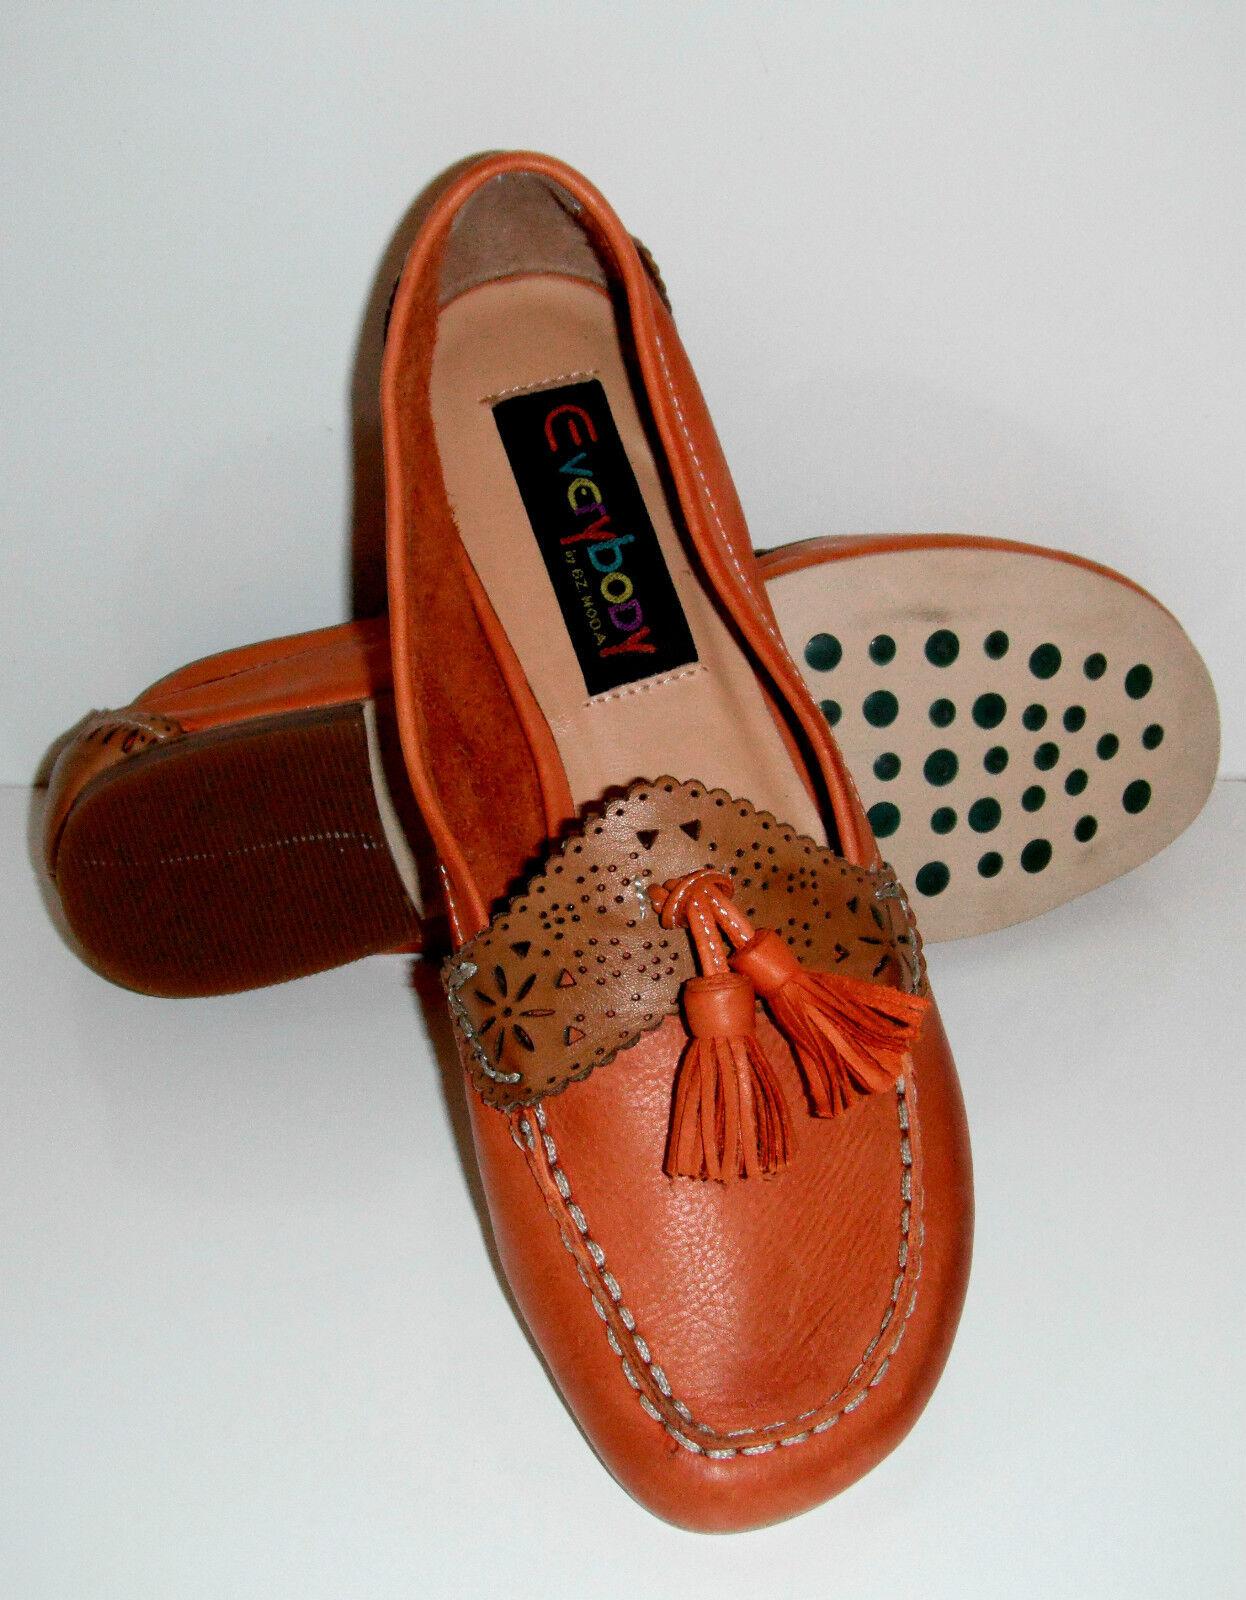 189 Everybody by by by B.Z.Moda Moderna WMN Glove Leder Schuhe sz 6.5 Fantastic Fit 6fdf9f